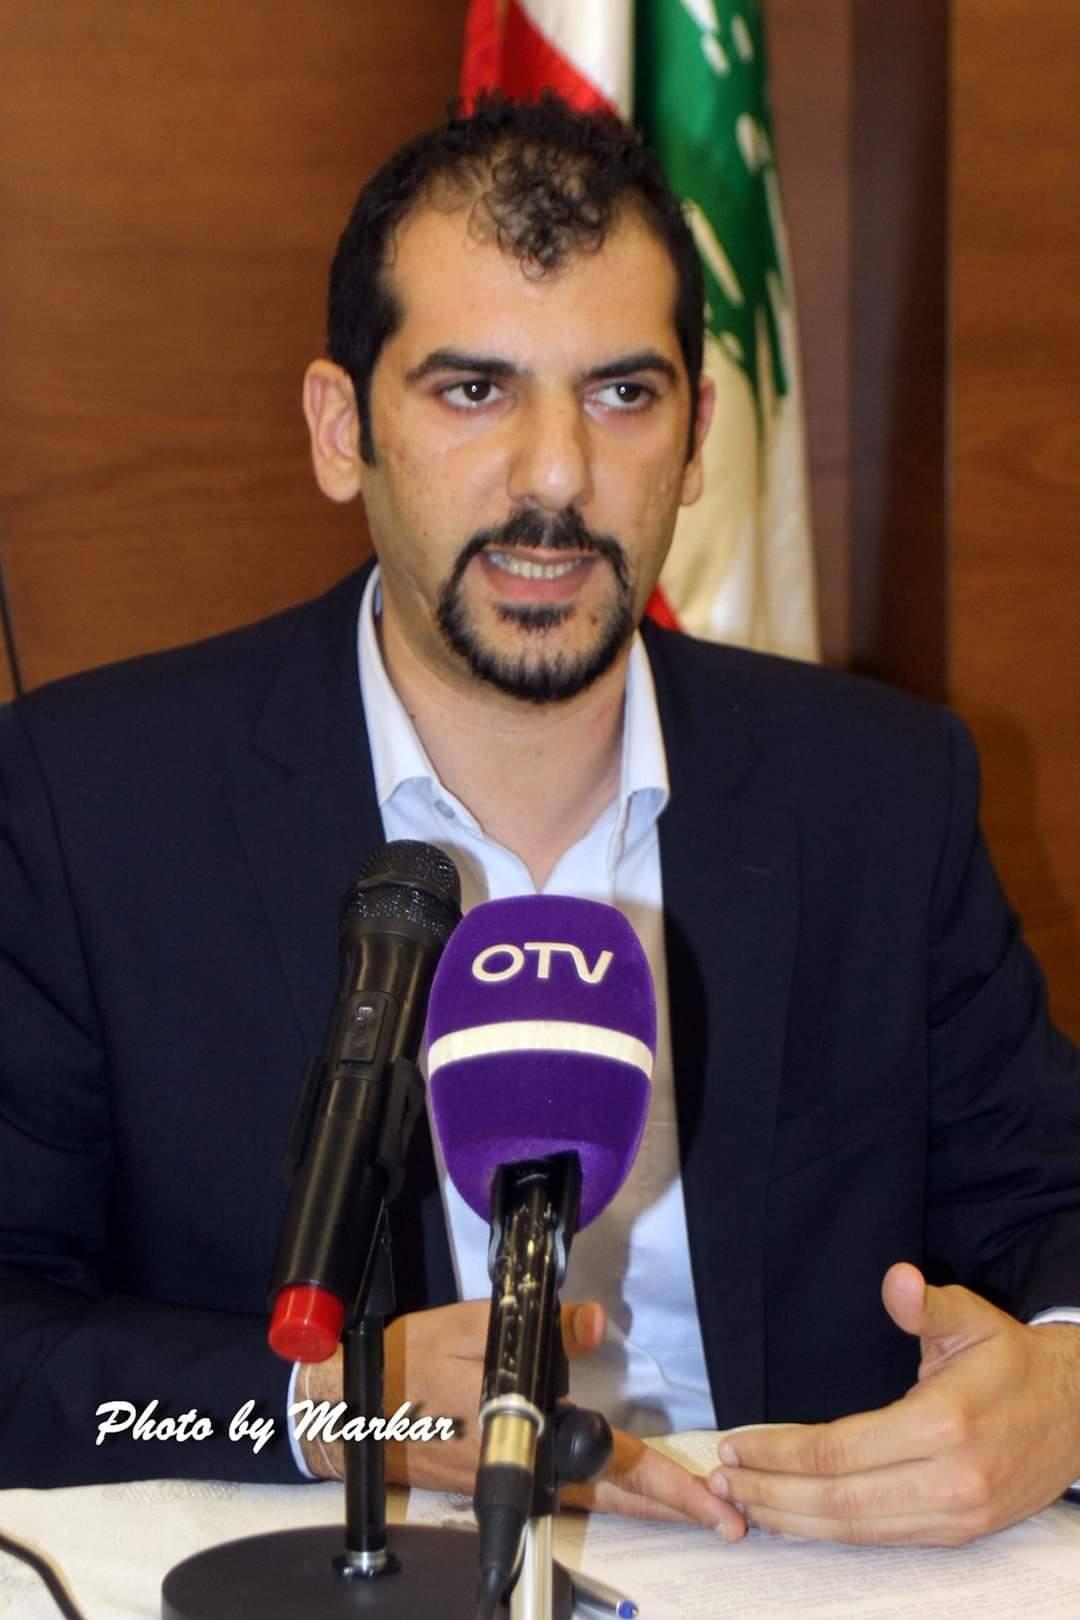 Yeghia Tashjian